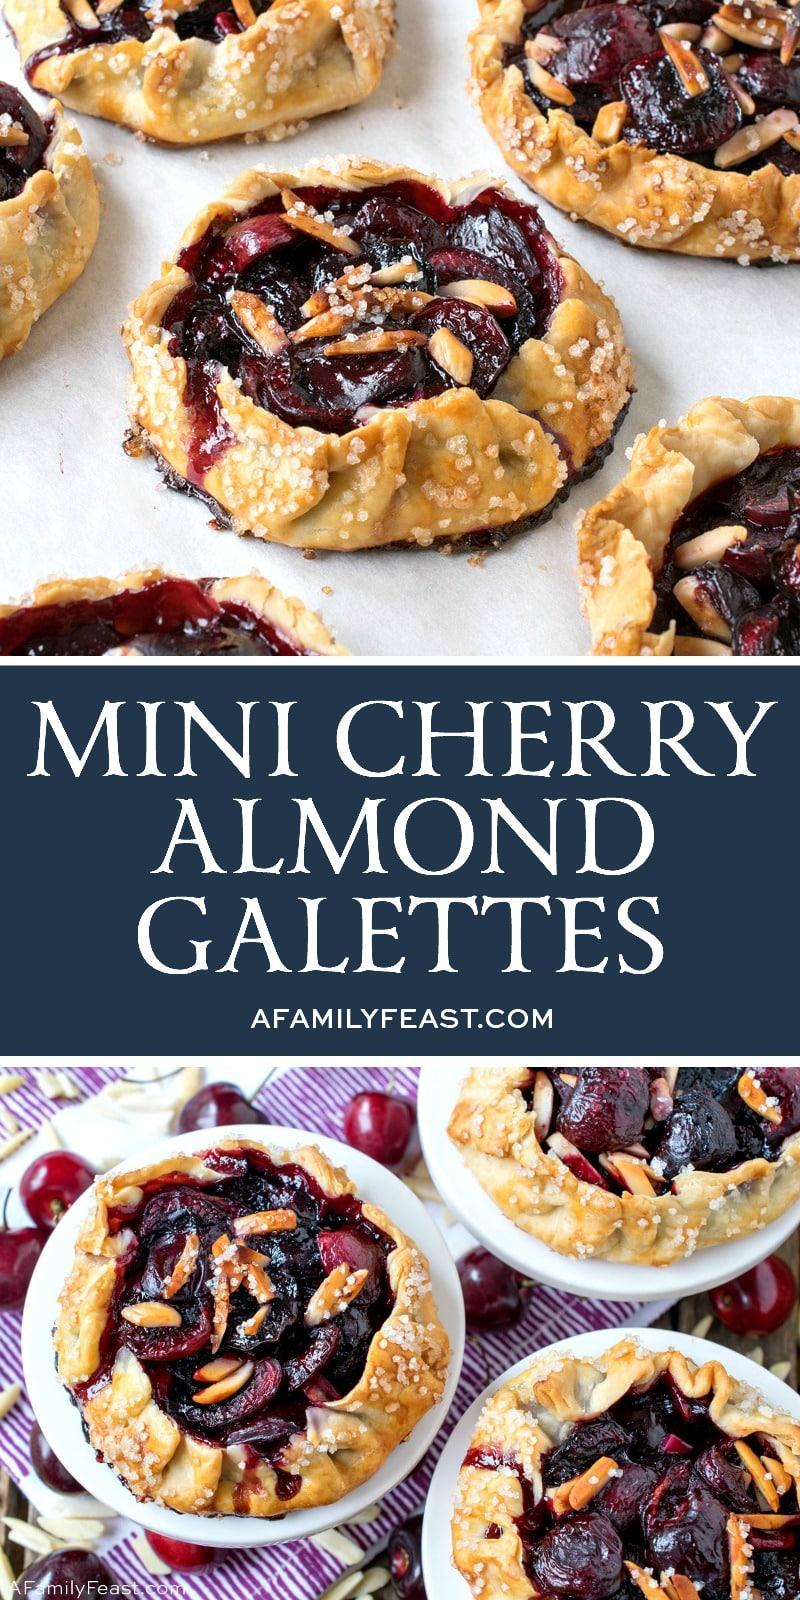 Mini Cherry Almond Galettes